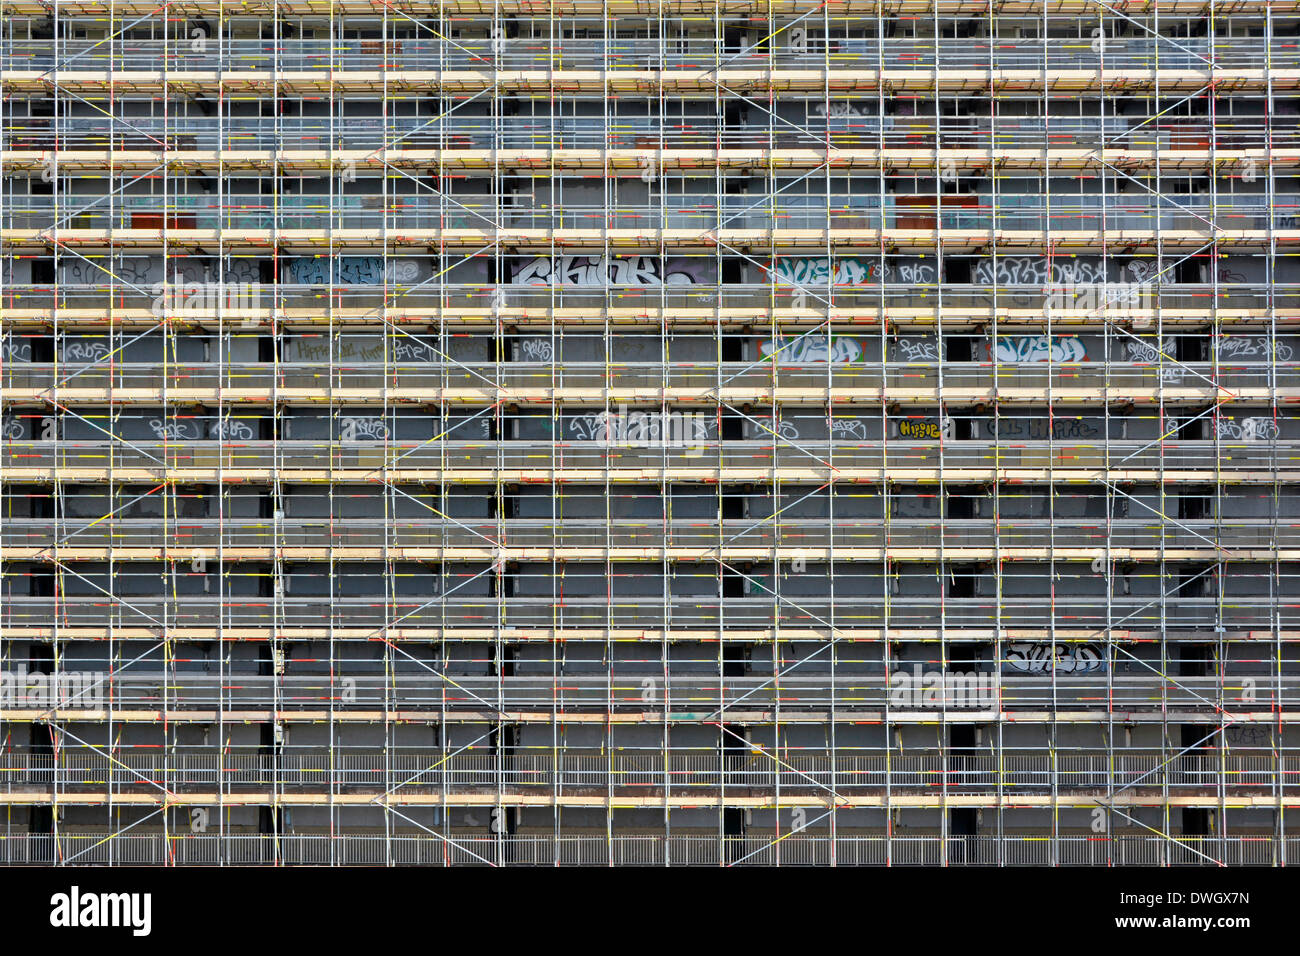 Scaffolding erected around one large empty Heygate Estate high rise social housing blocks preparing for demolition Southwark South London England UK - Stock Image